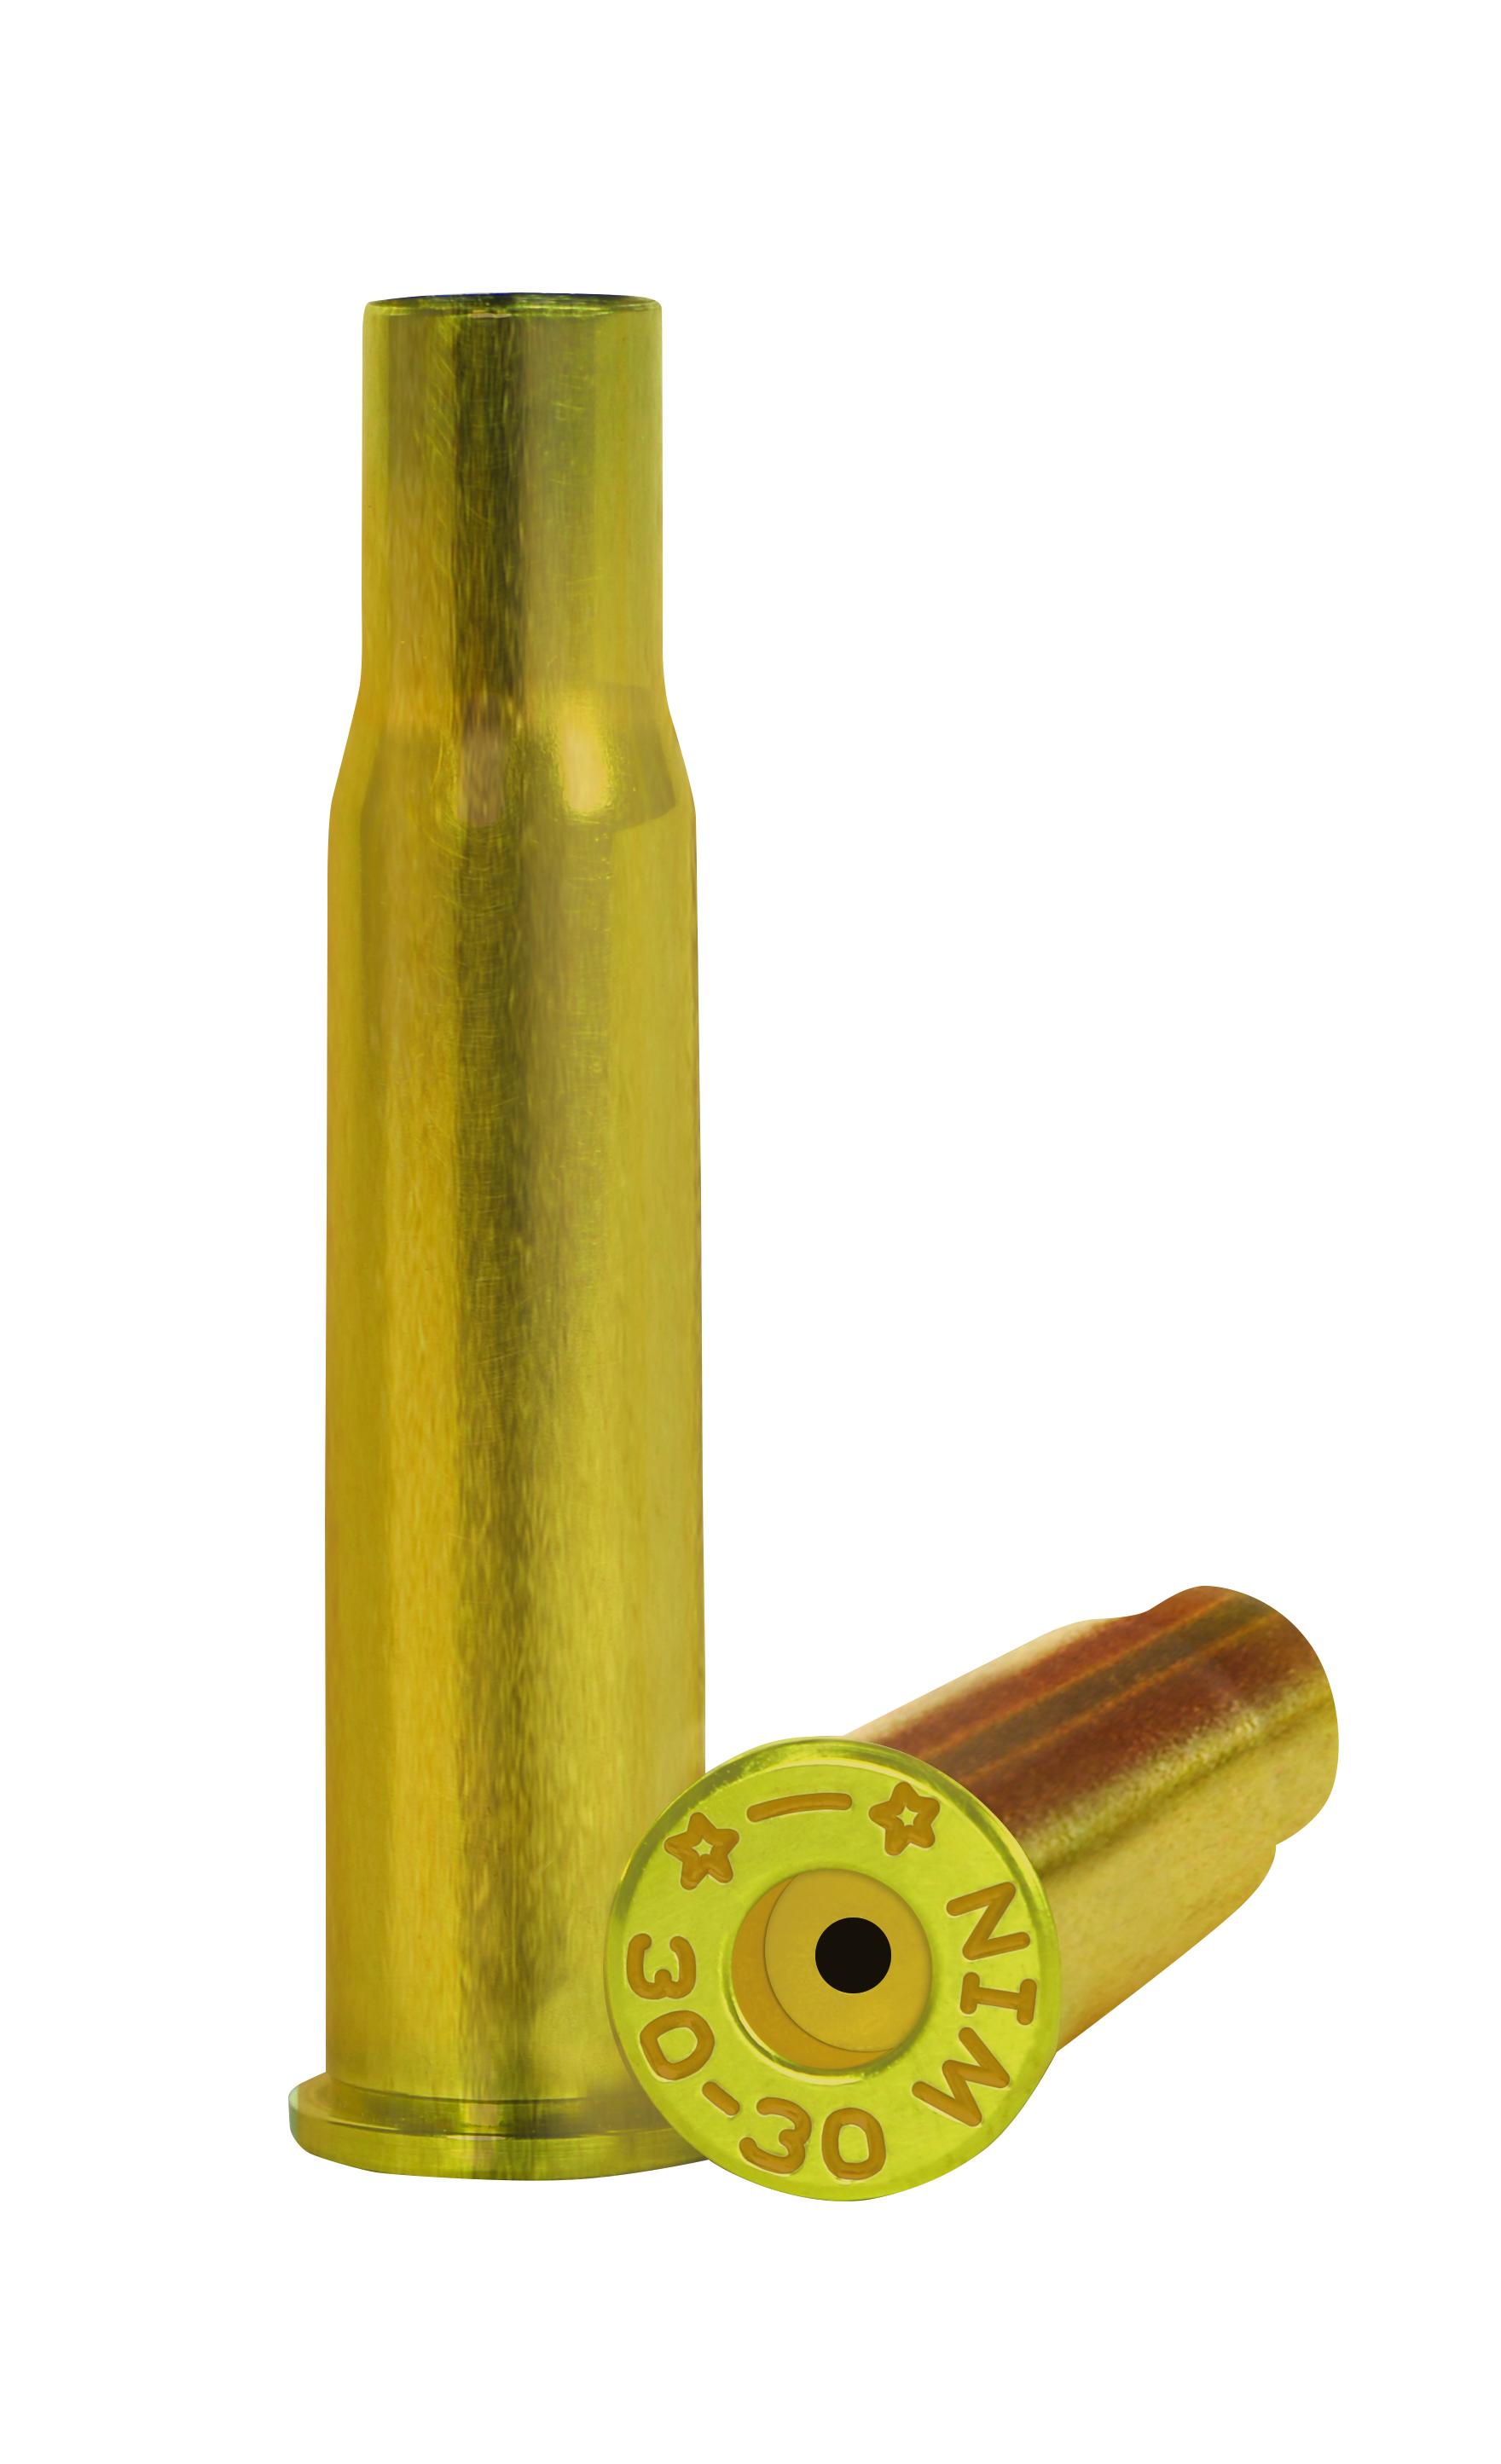 Starline brass 30-30 50 pack